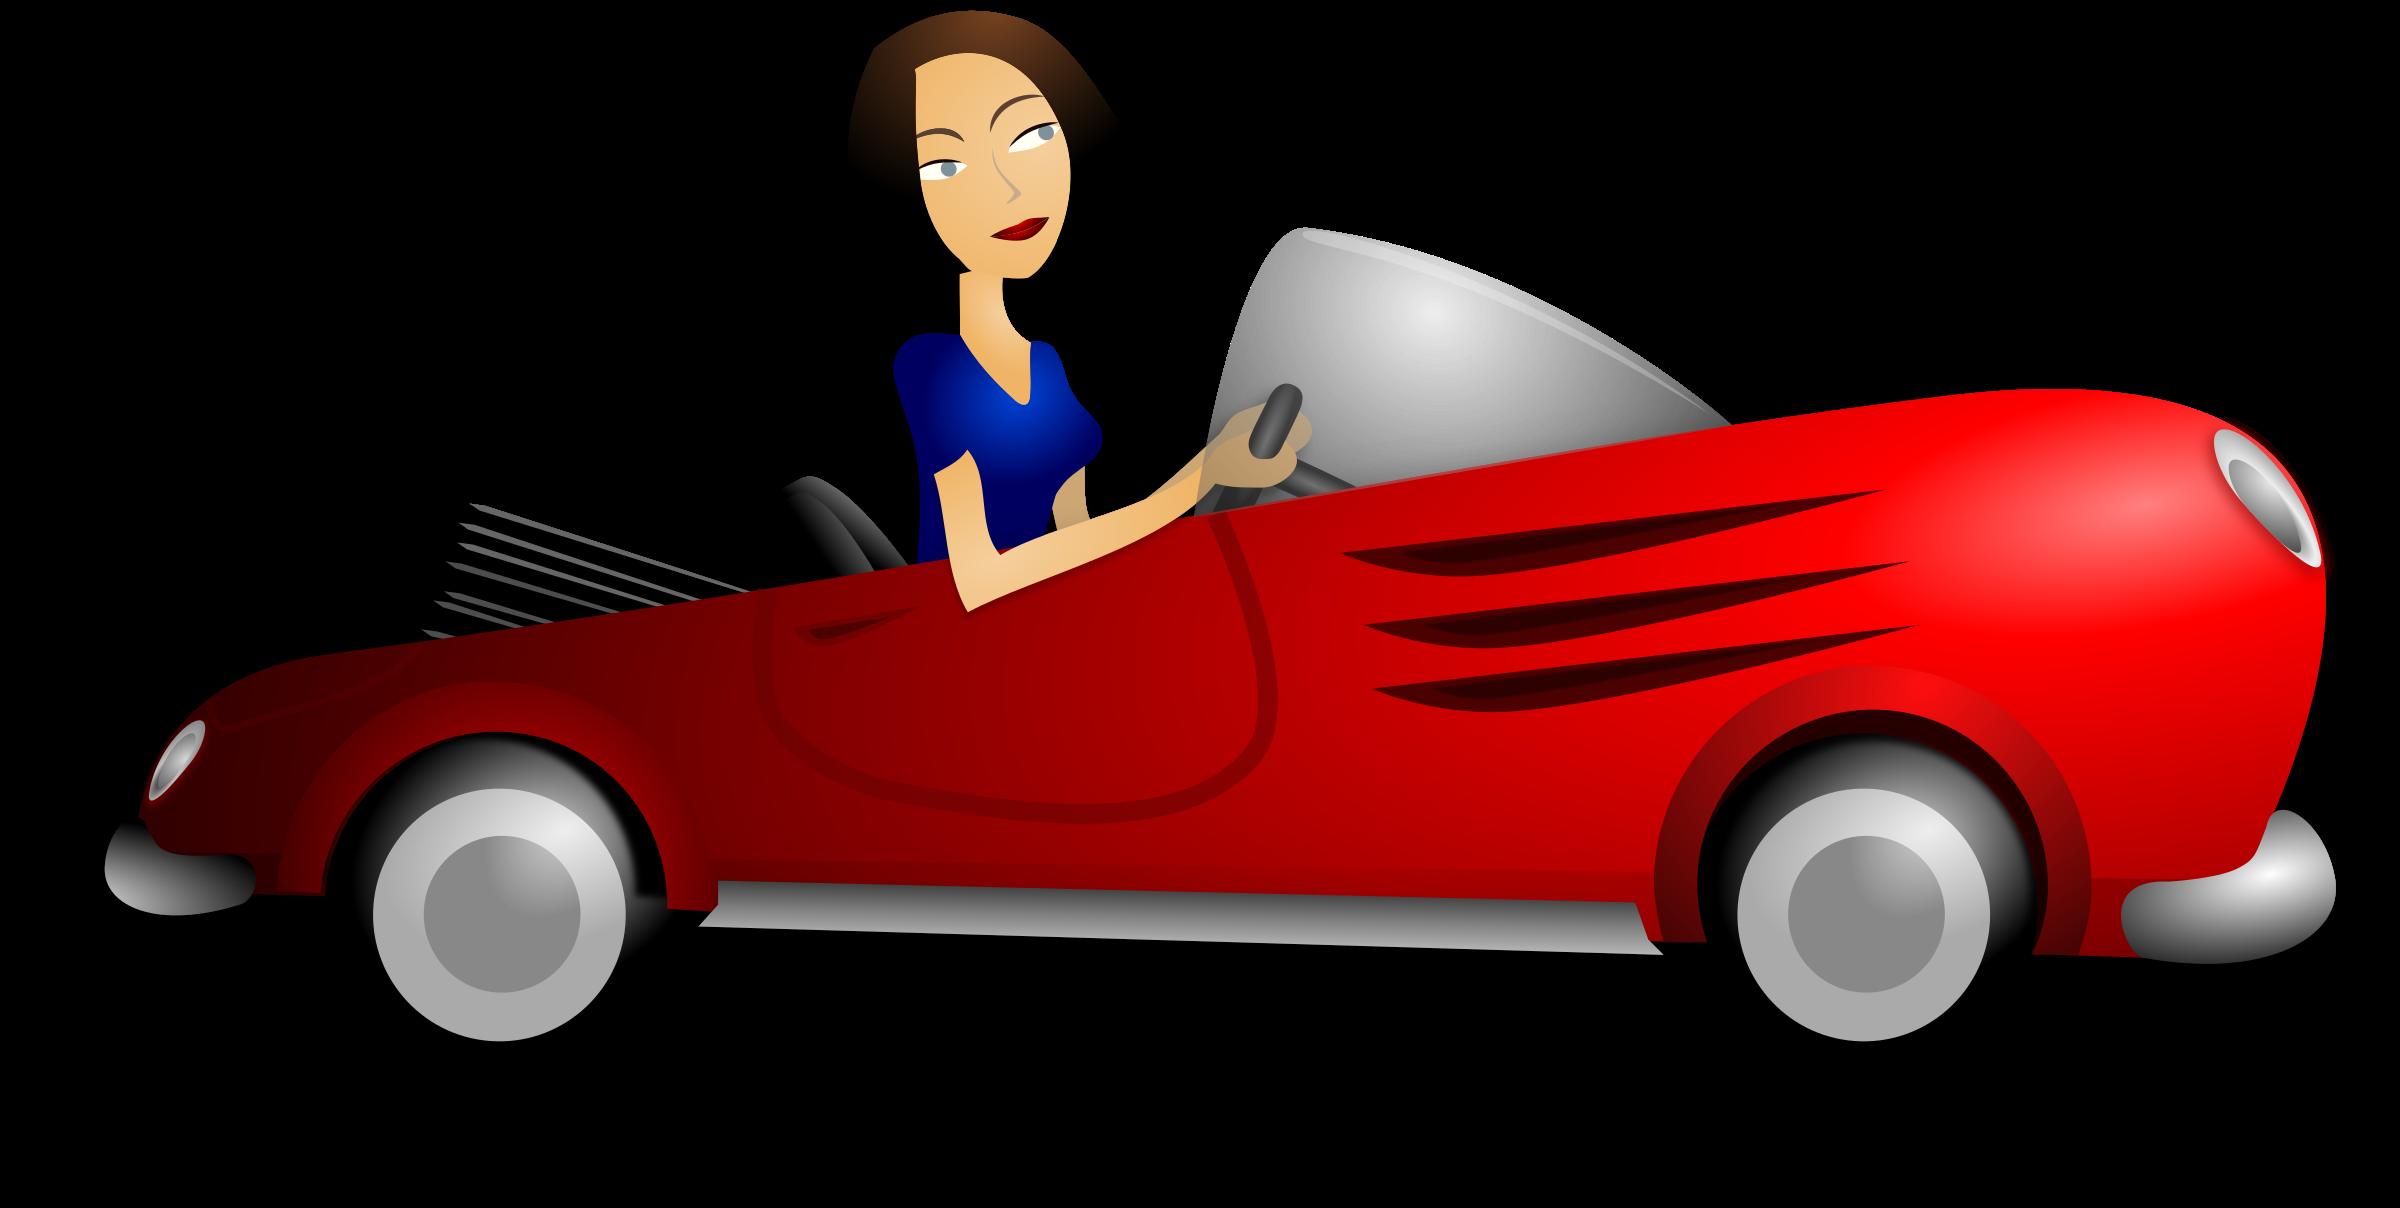 Clipart convertible car image transparent library Clipart - Brunette Female Driver image transparent library